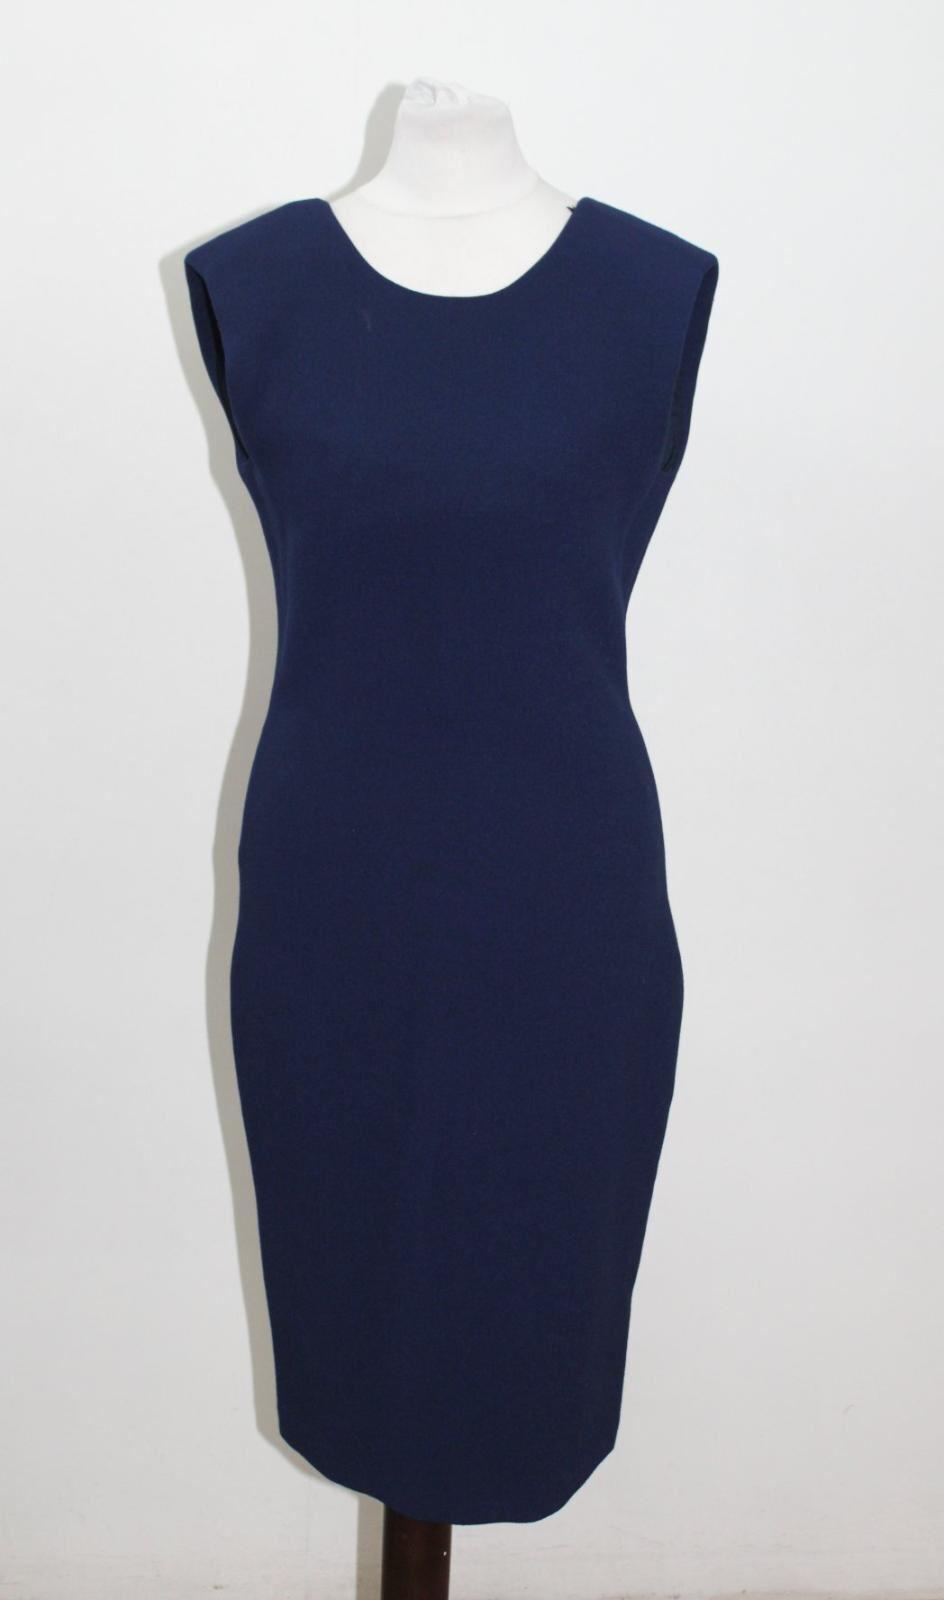 NEW SABA Ladies Navy Blau Sleeveless Crew Neck Pencil Hannah Dress UK8 EU36